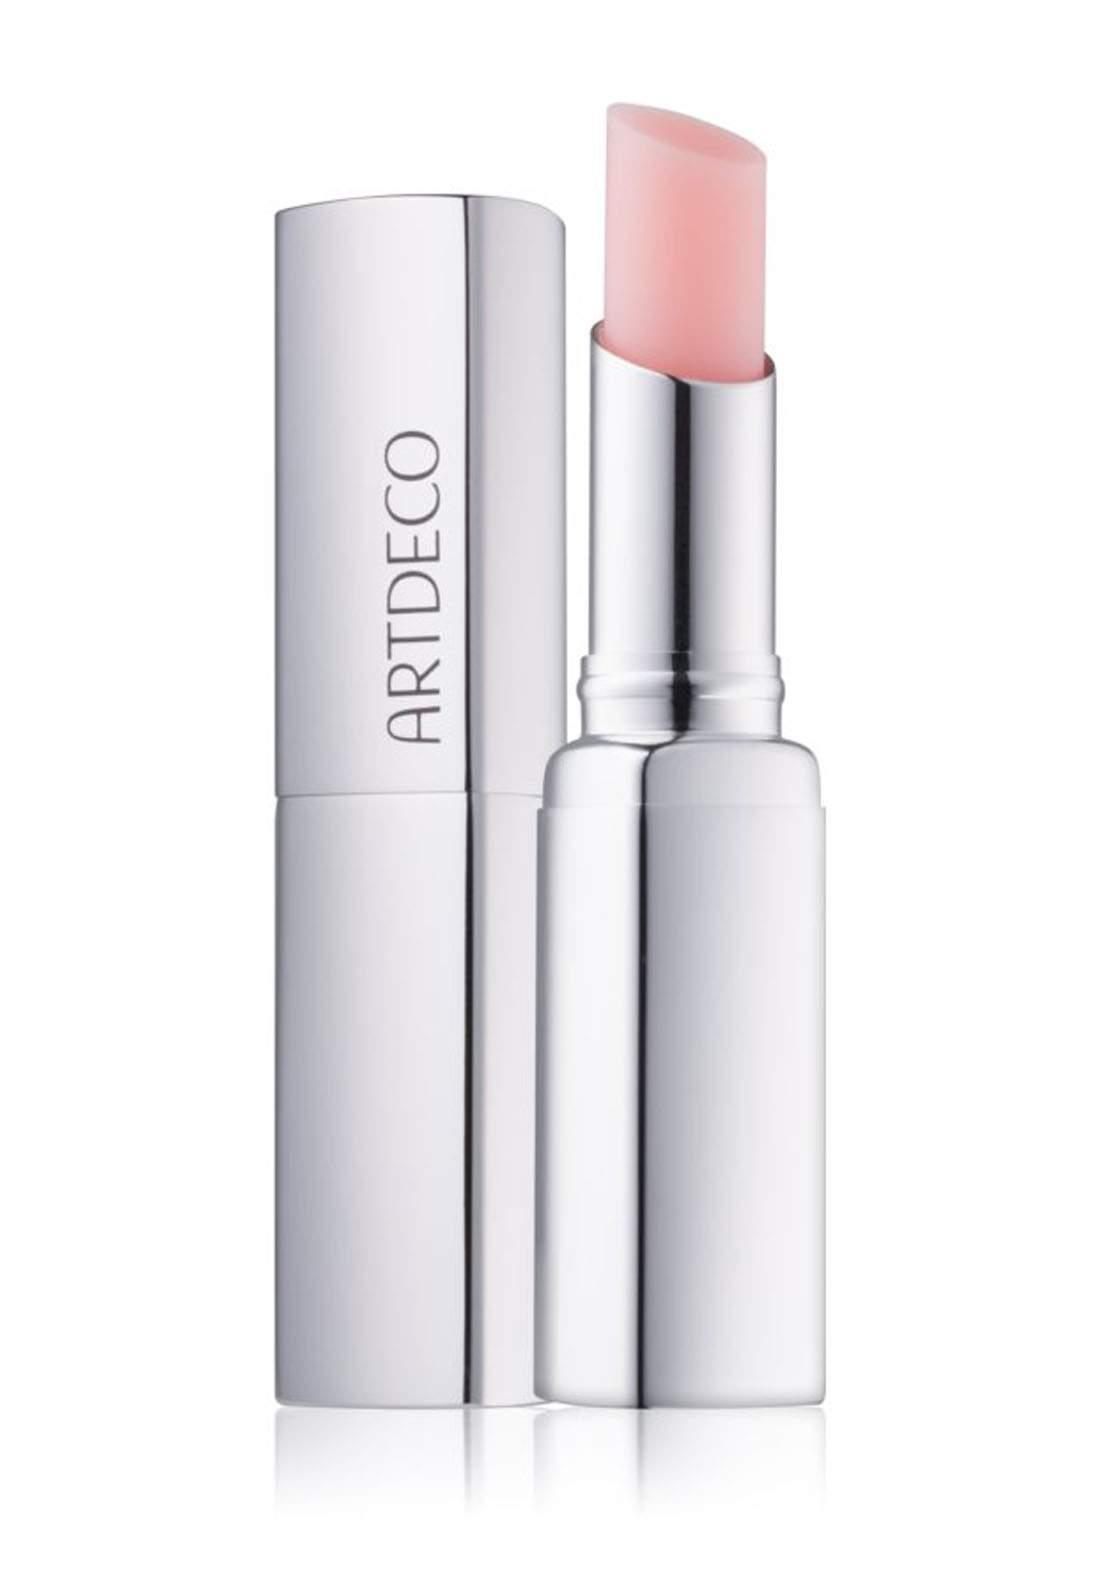 Artdeco Color Booster Lip Balm Lip Balm, Pink, Boosting Pink 3Ml مرطب للشفاه